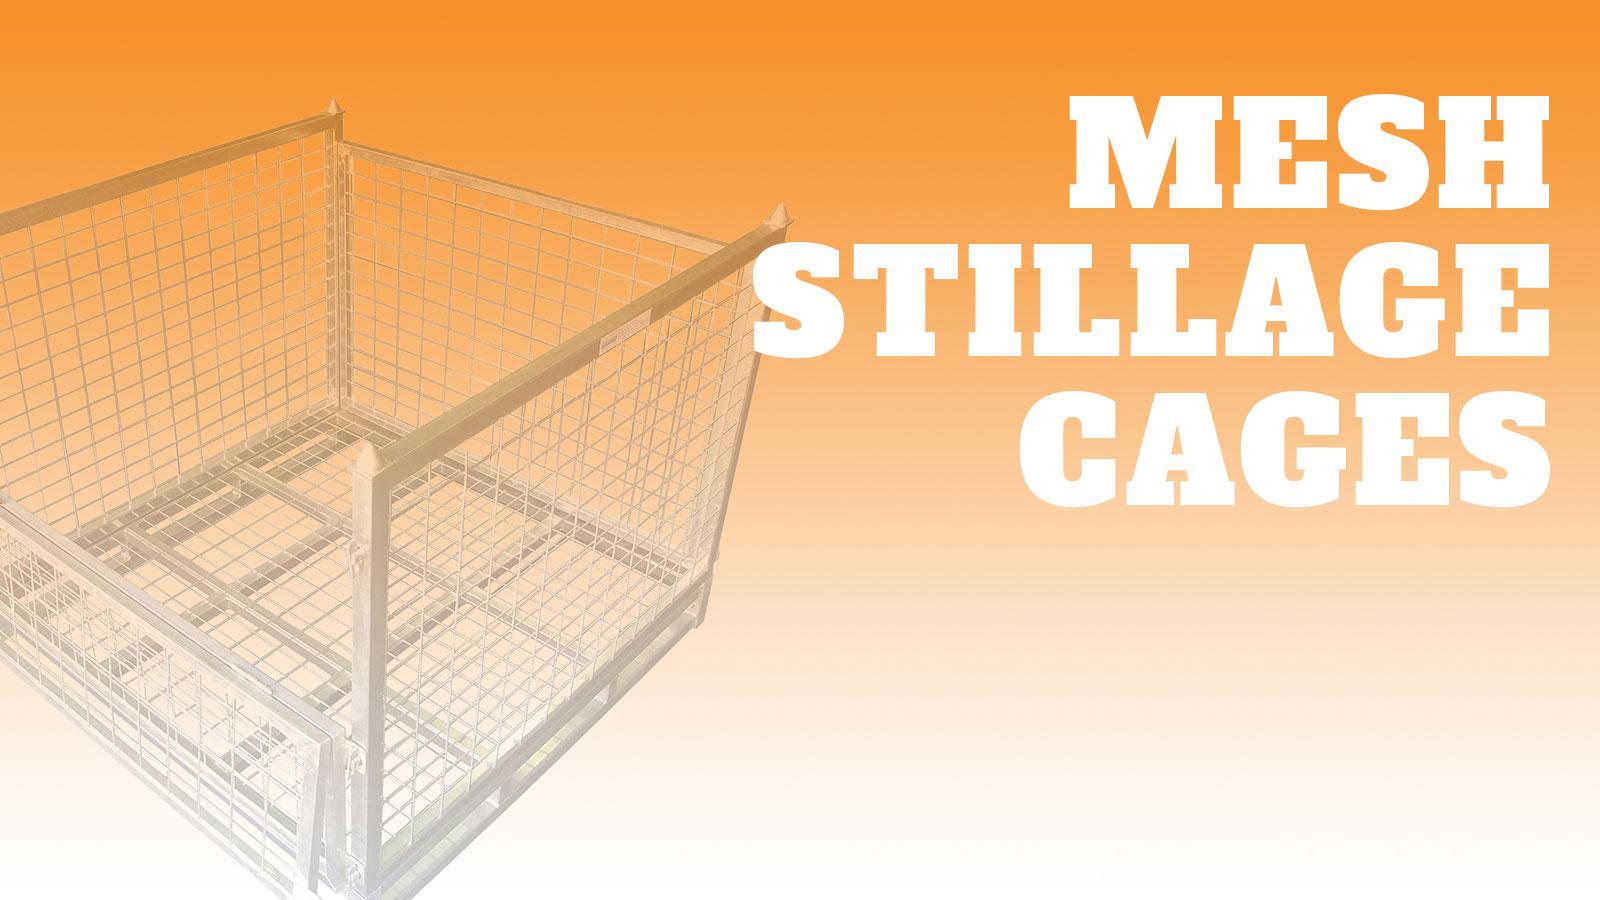 Industrial-Mesh-Stillage-Cages